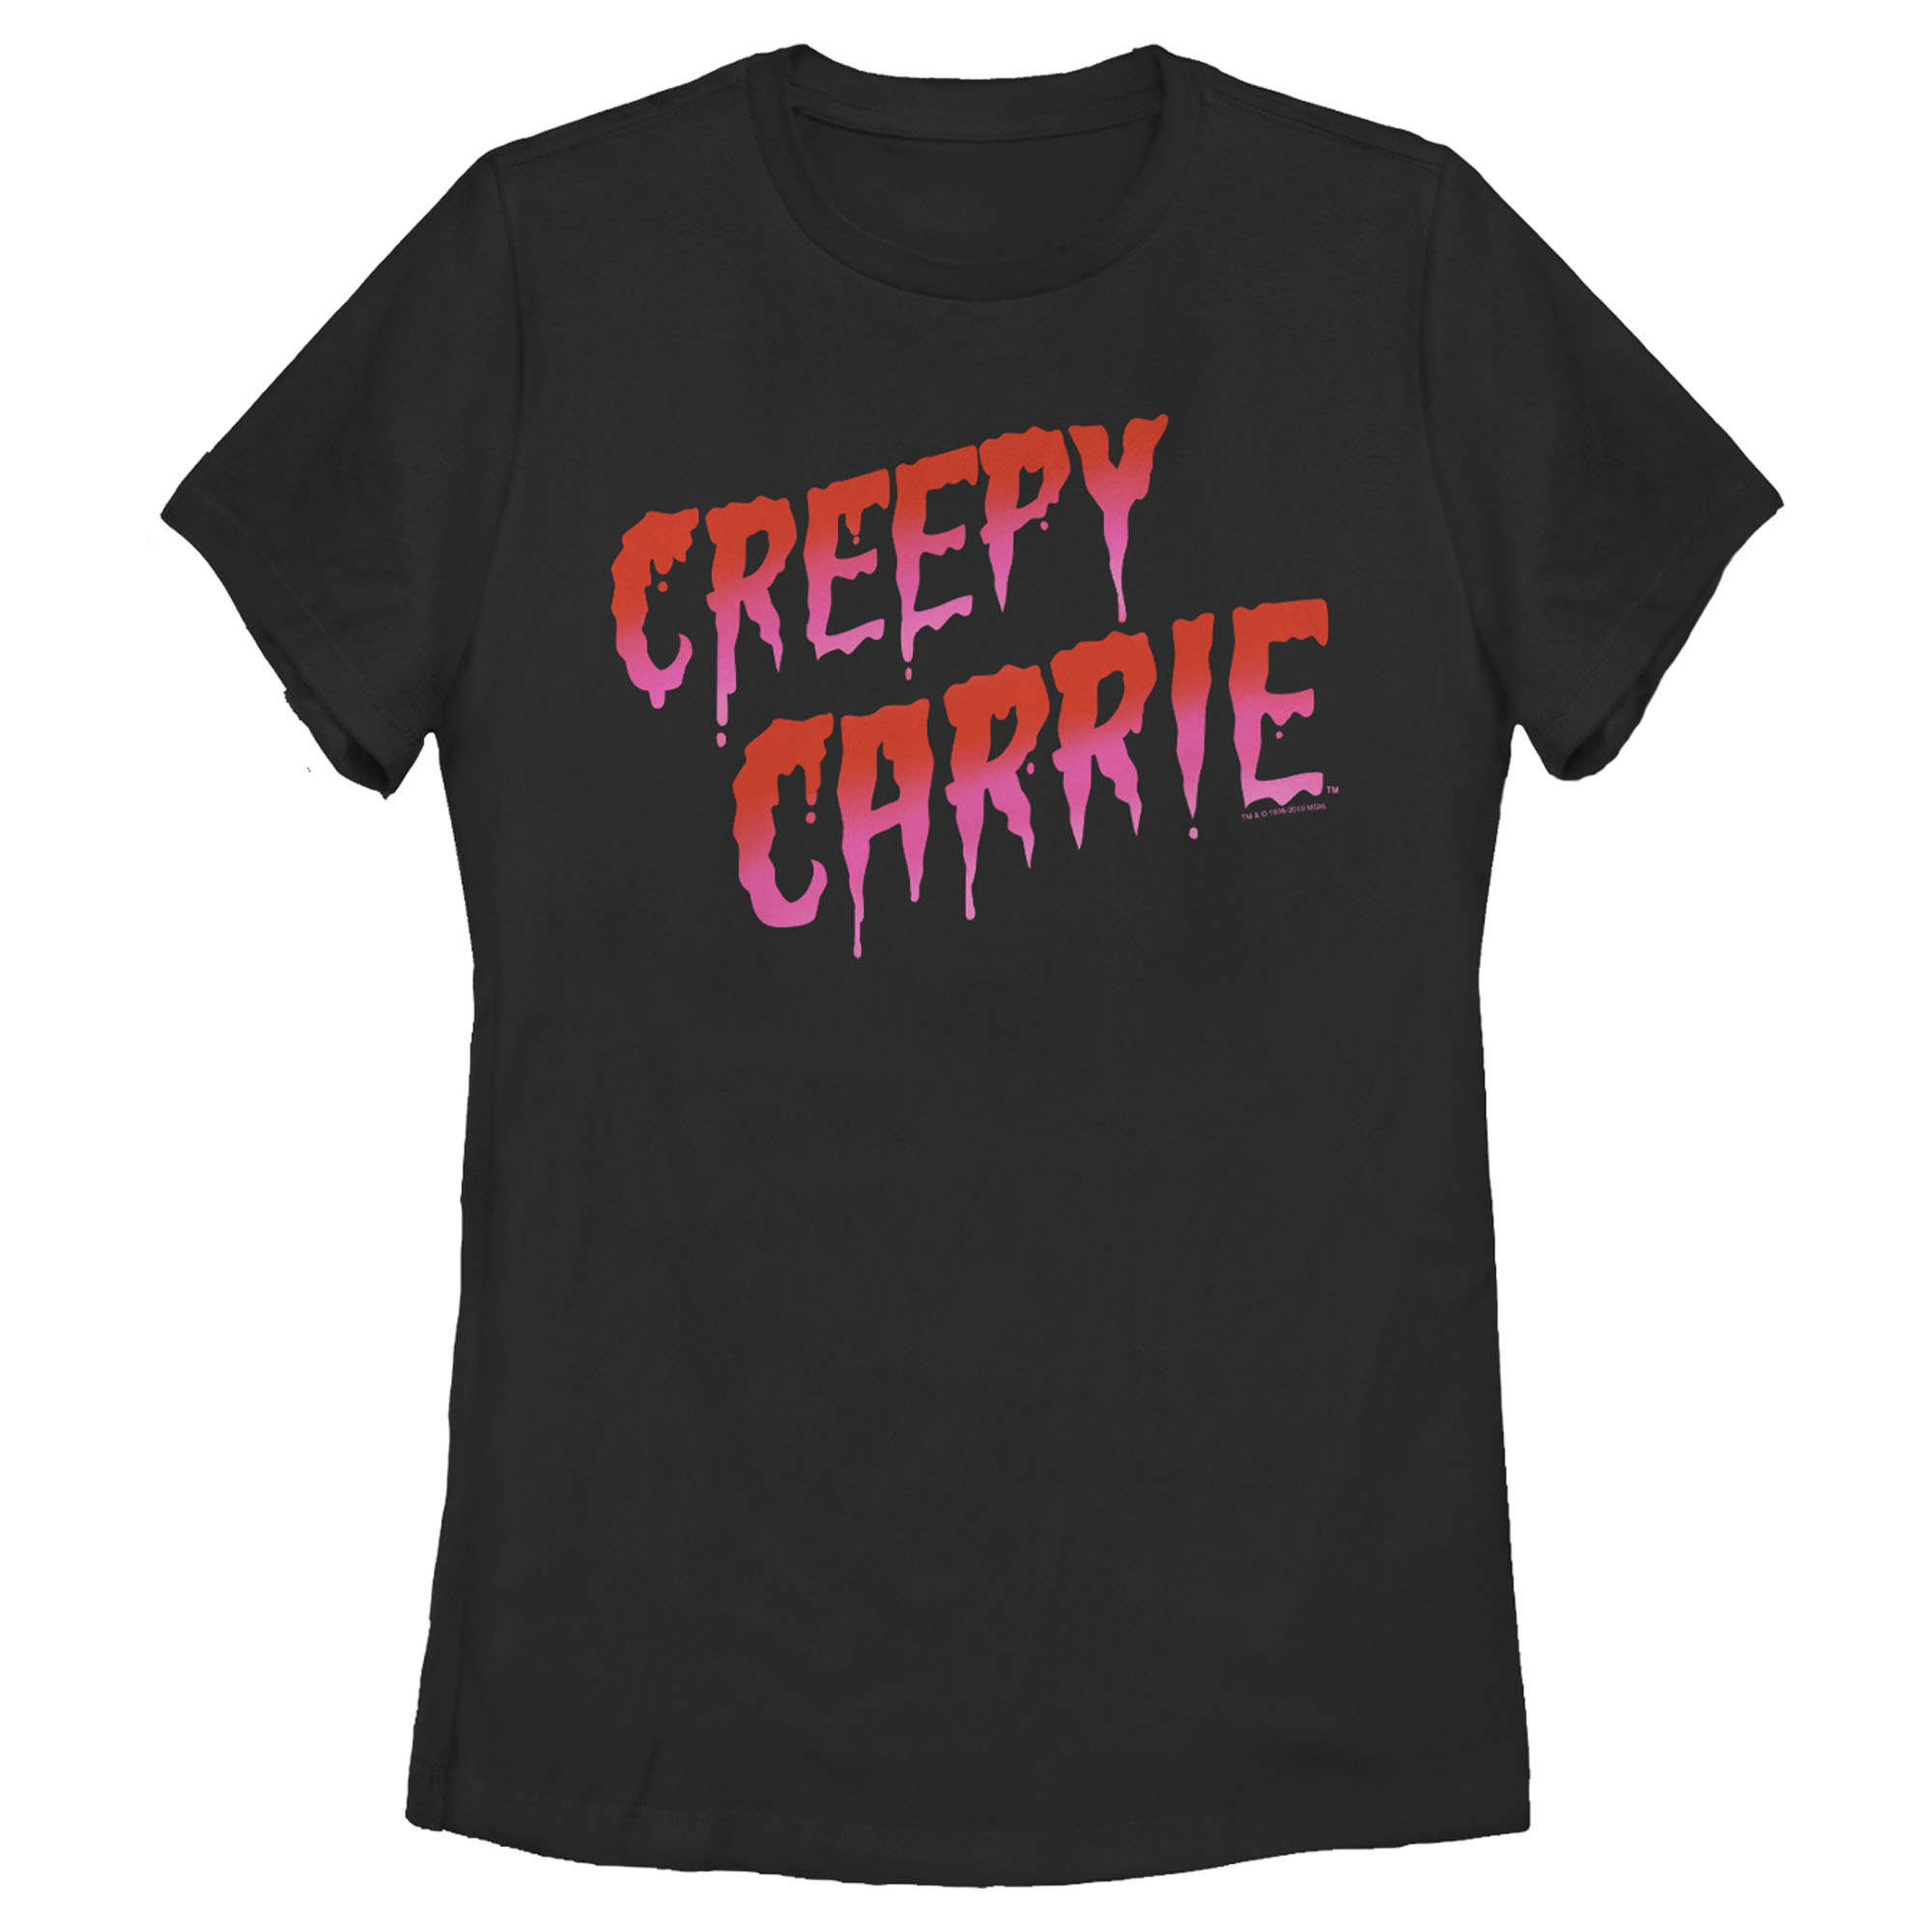 Carrie - Women's Carrie Creepy Nickname T-Shirt - Walmart ...